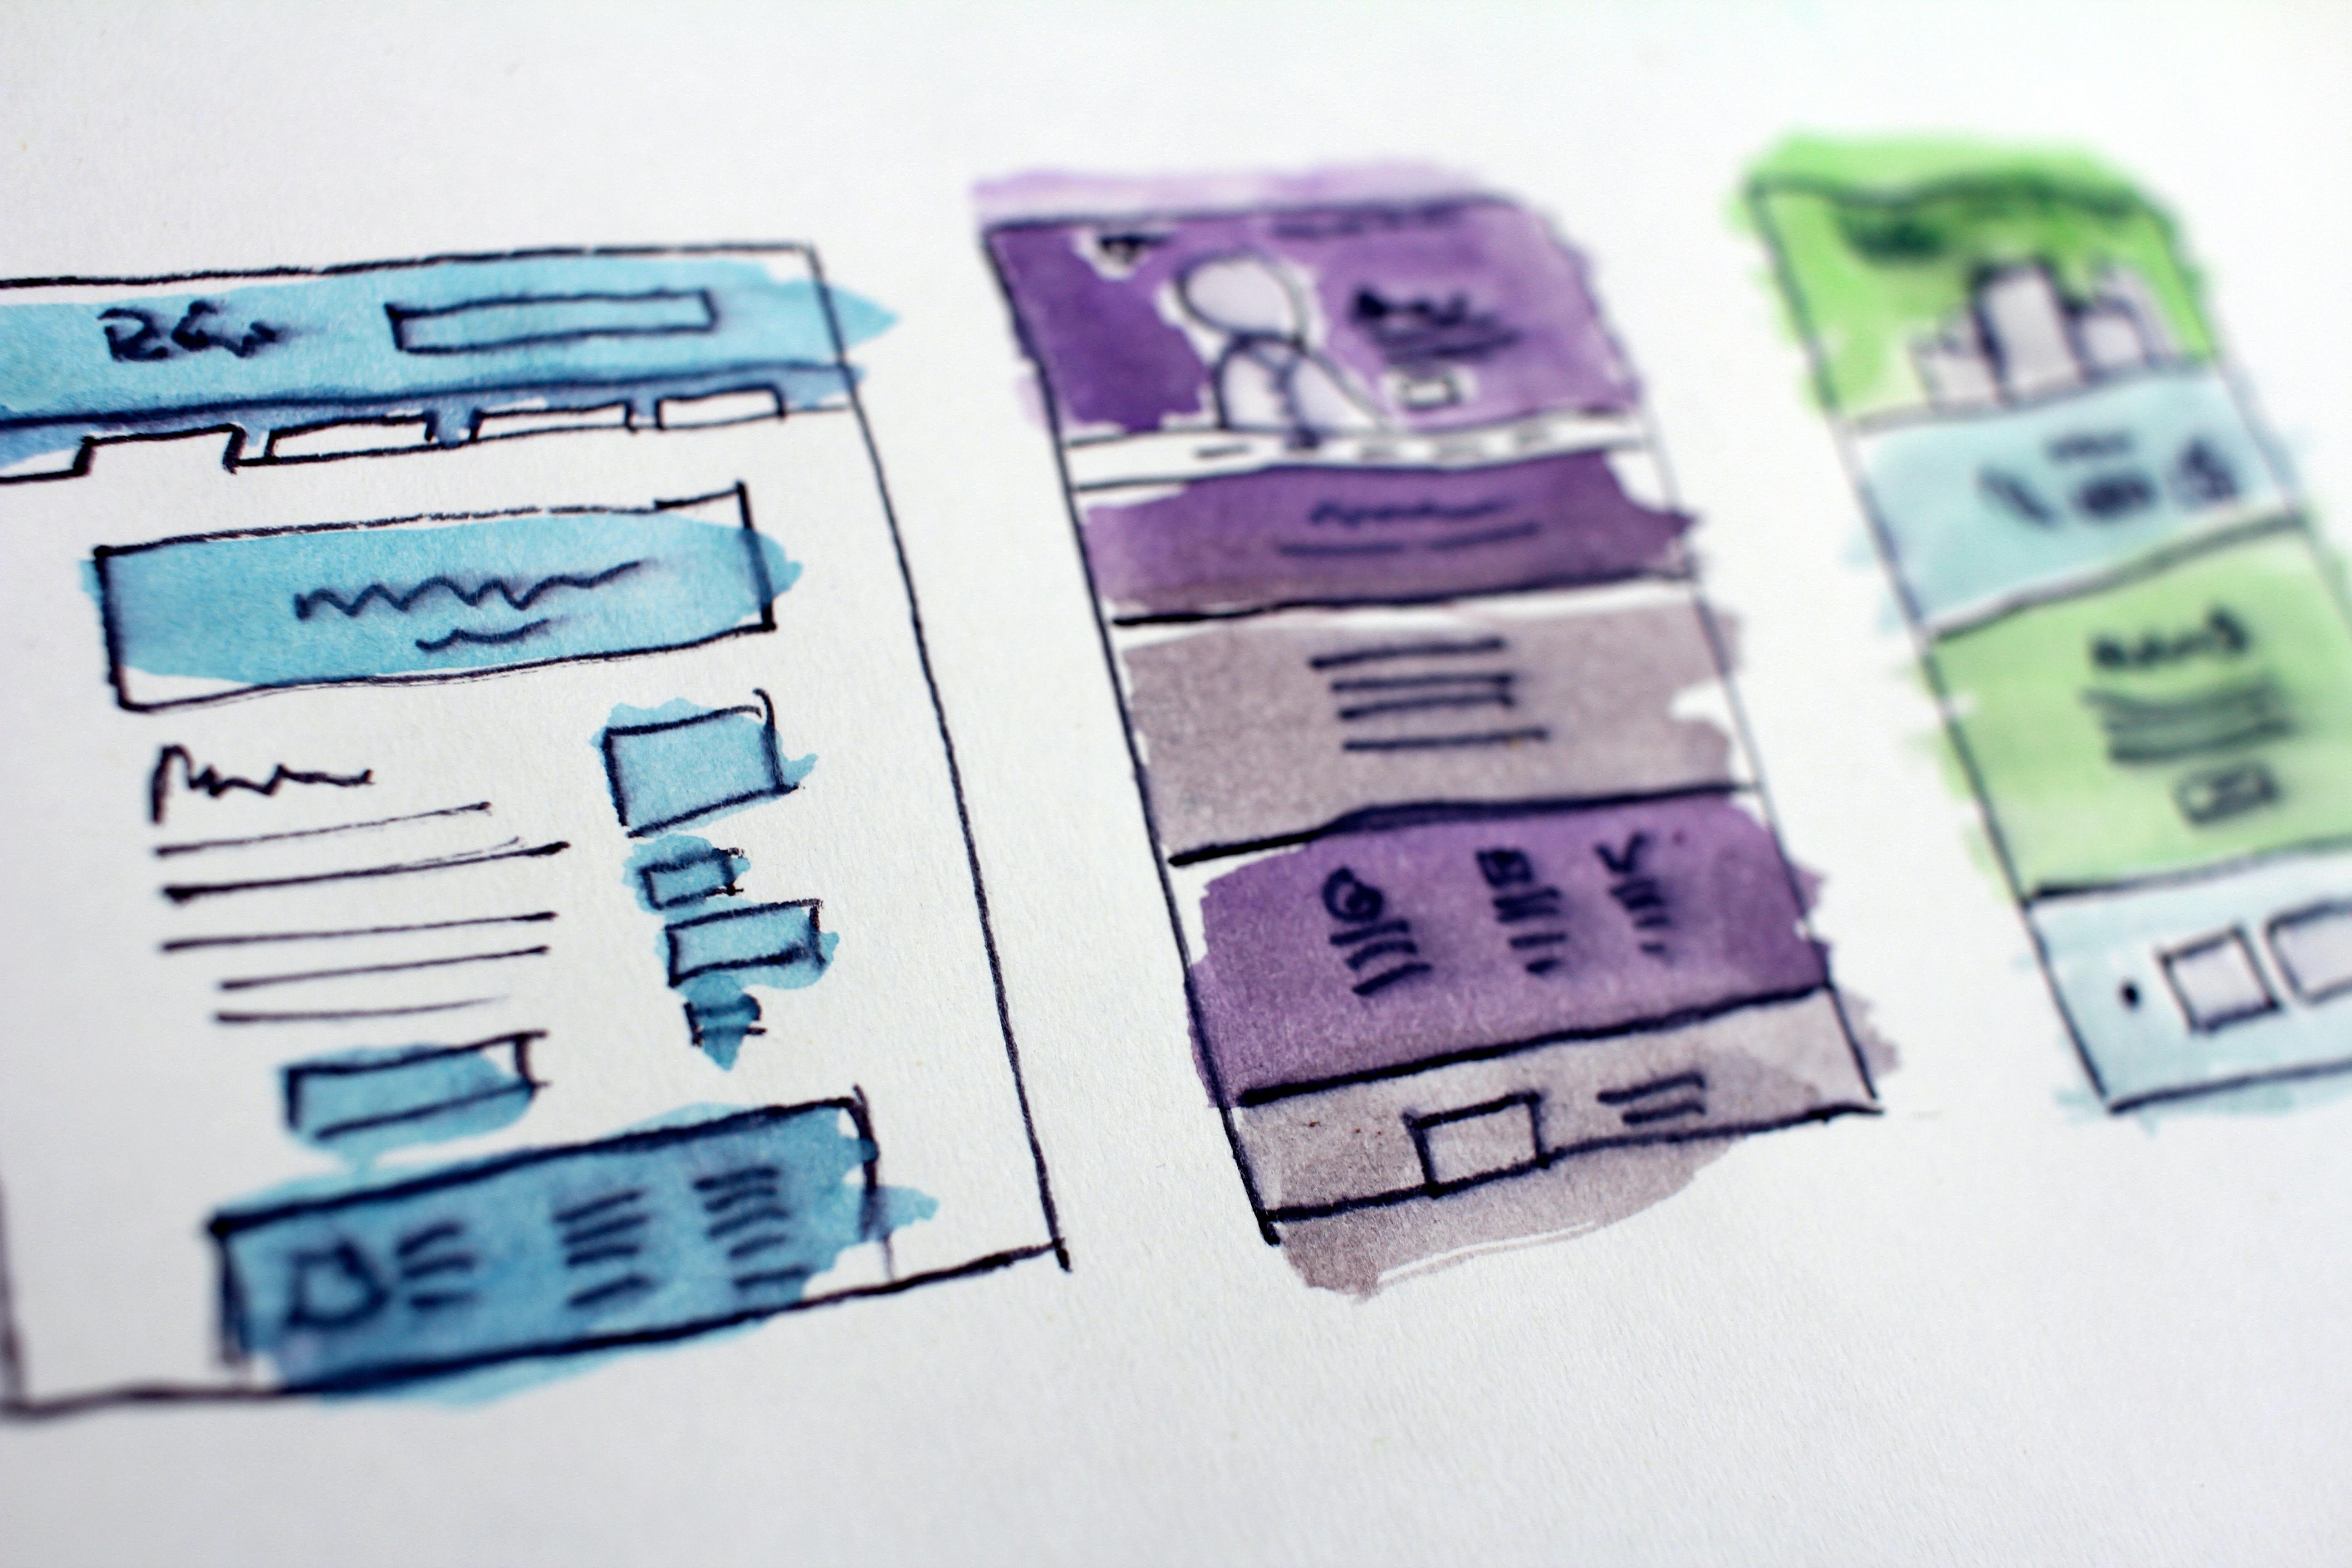 website designs - bouncing back with a better website